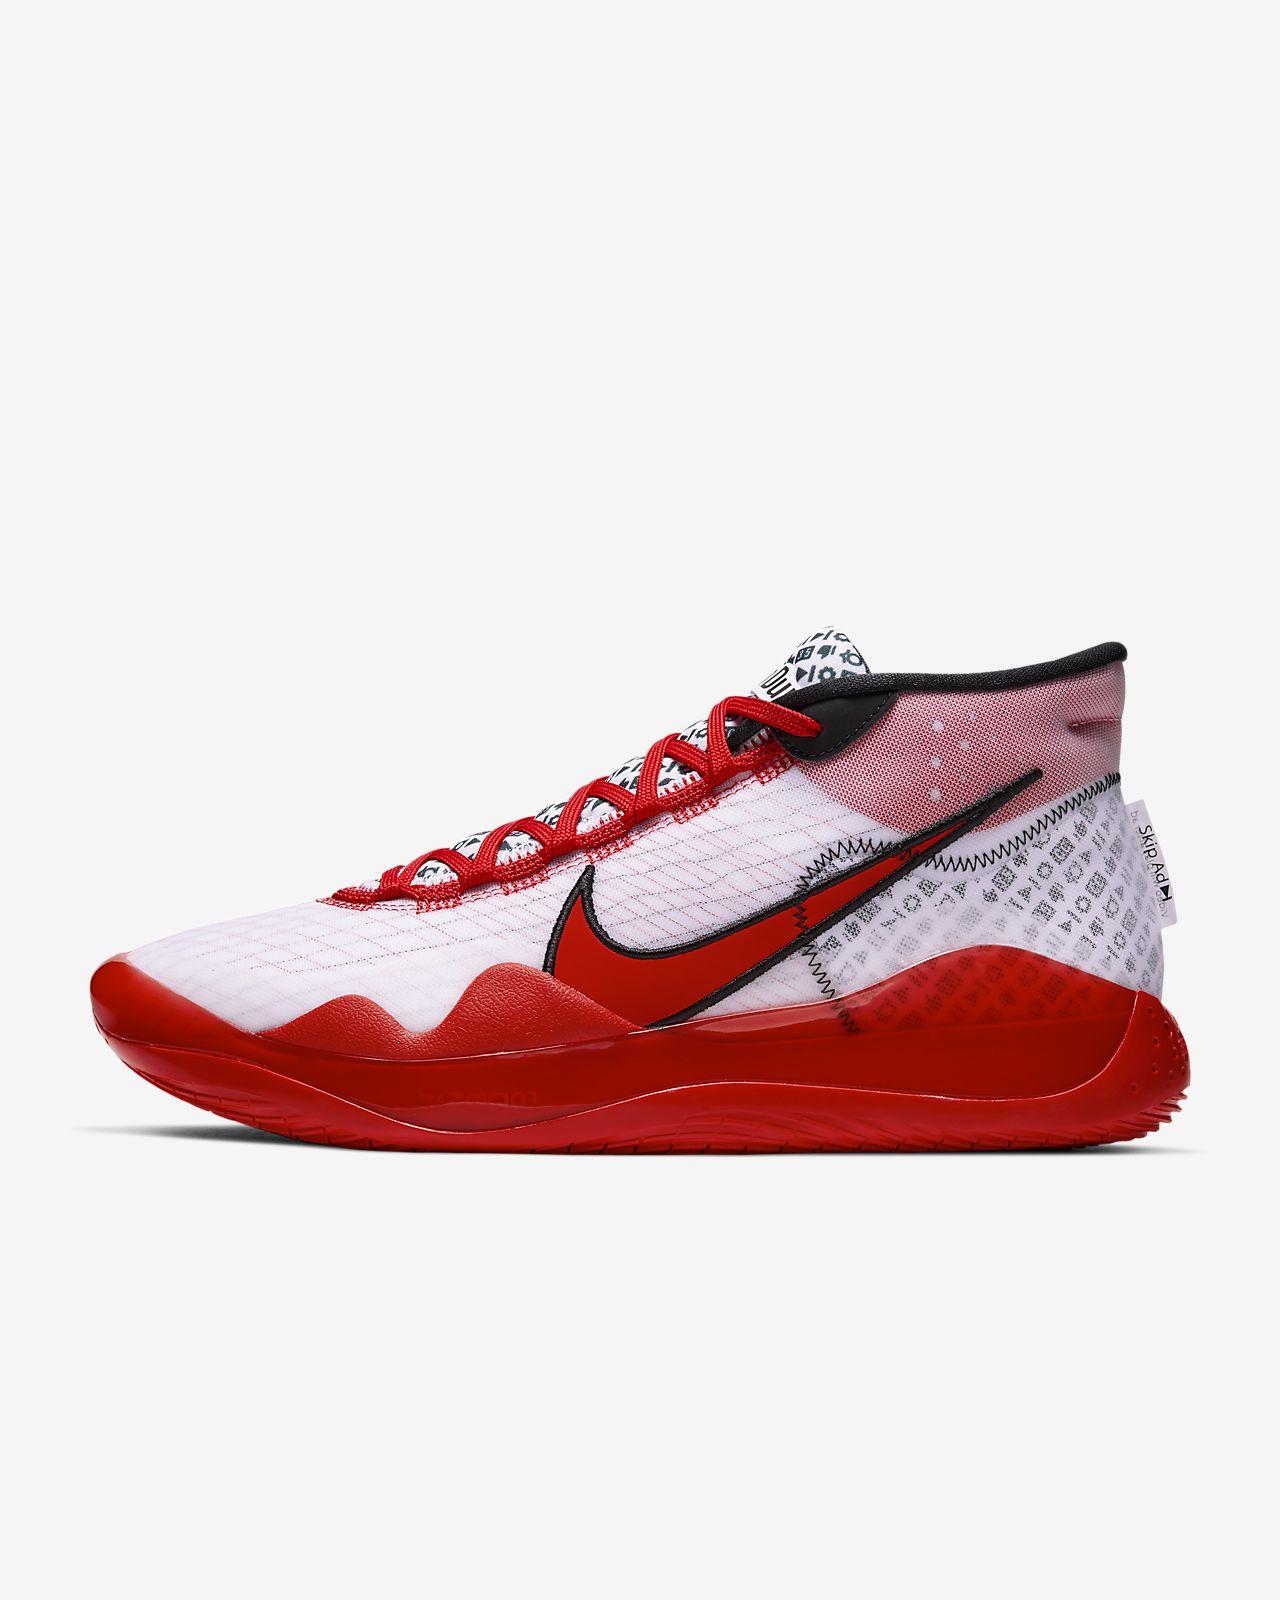 Chaussure de basketball Nike Zoom KD12 « YouTube »